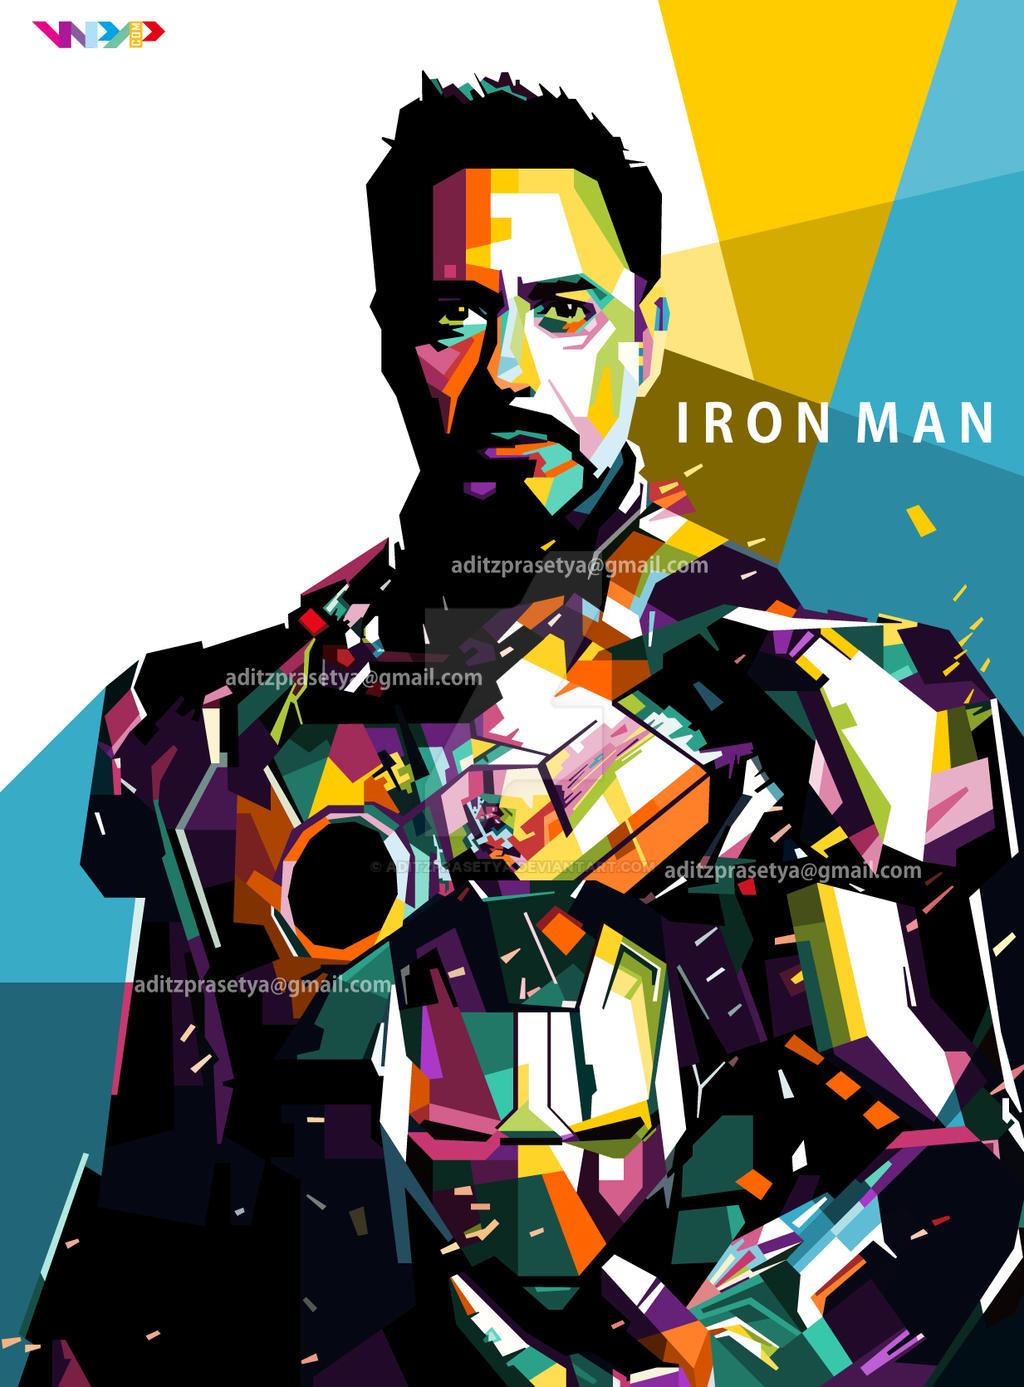 Iron Man Pop Art By Aditzprasetya On Deviantart